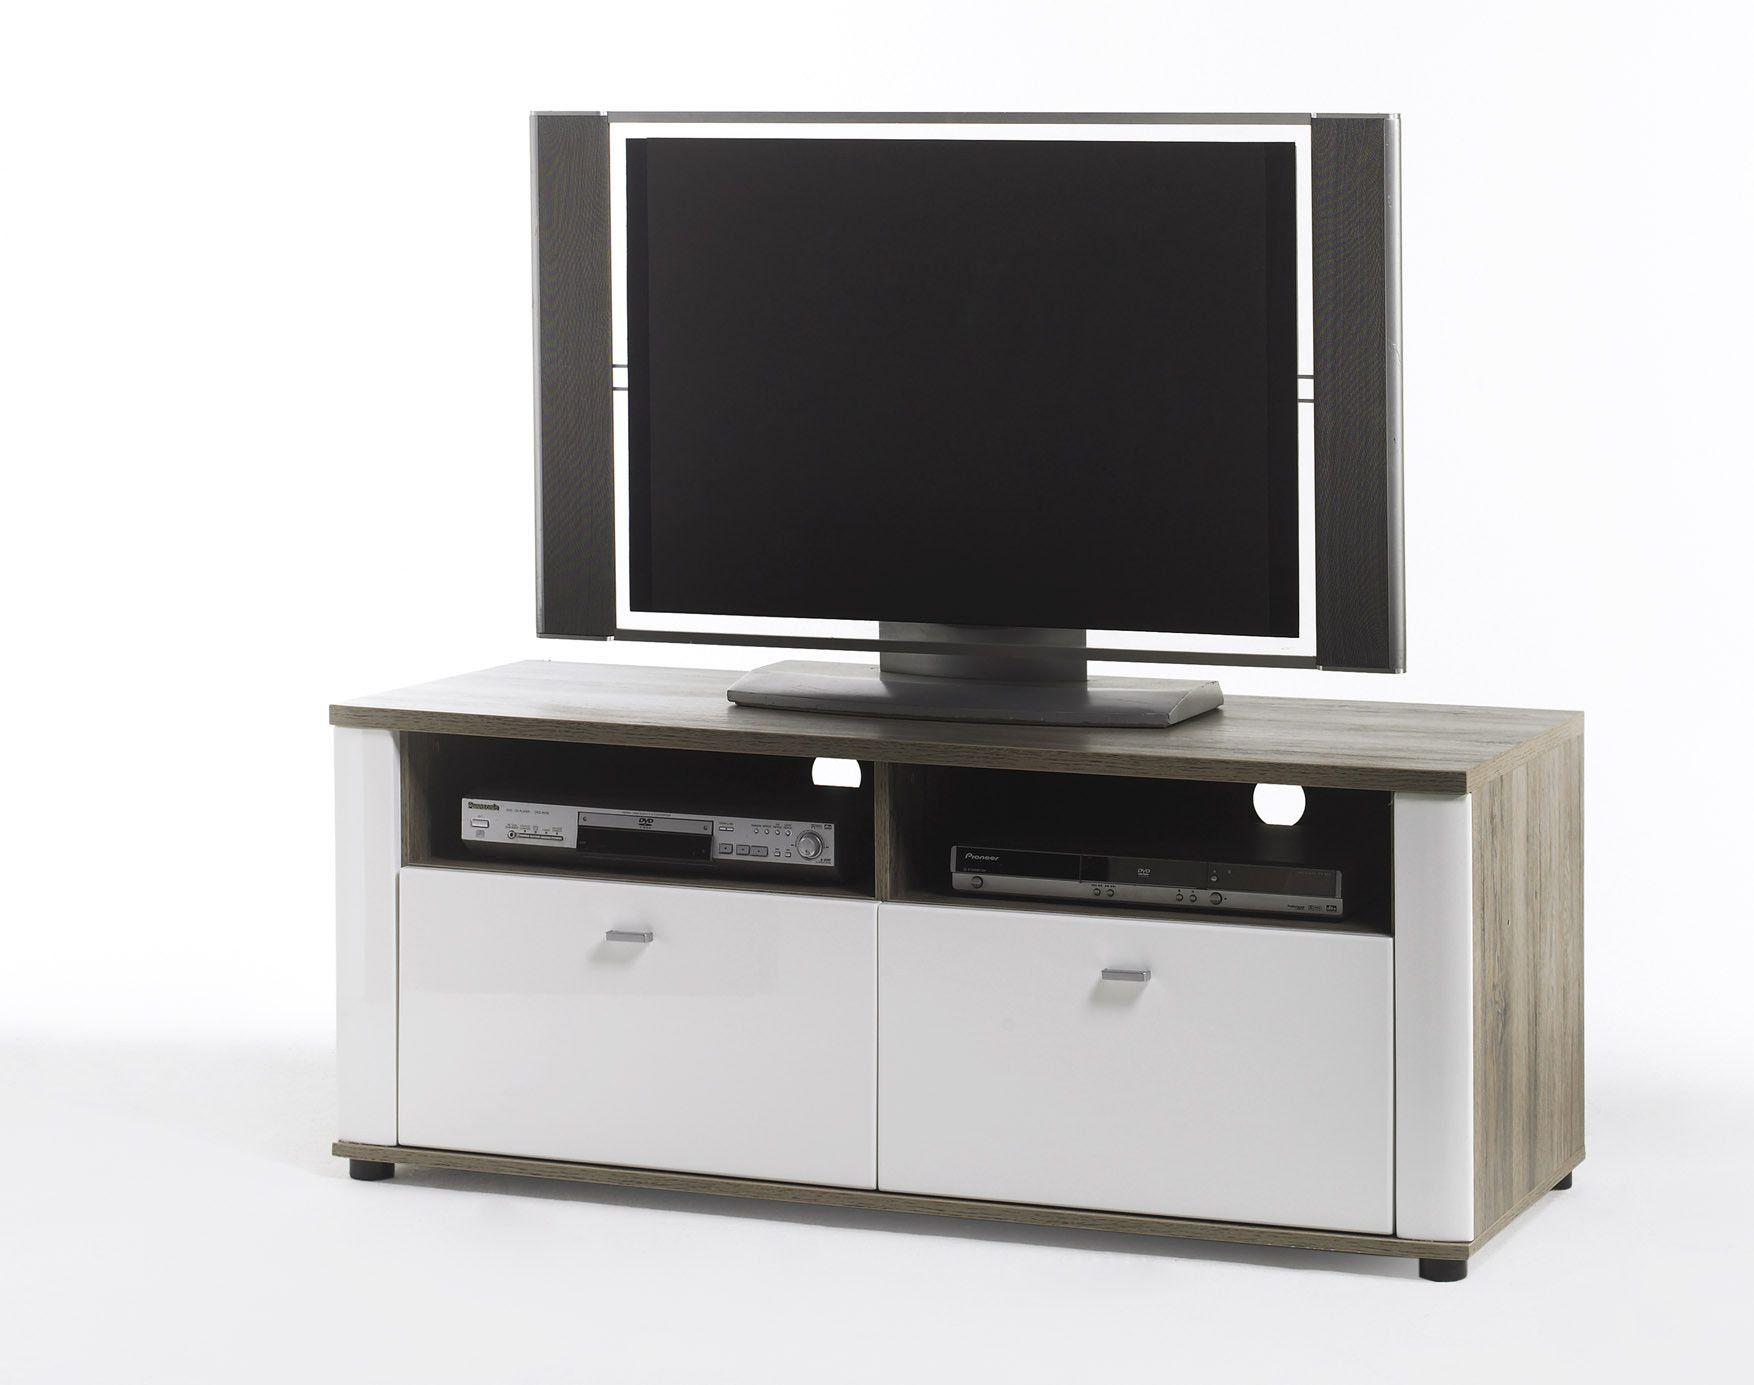 Pin By Ladendirekt On Tv Hifi Mobel Tvs Storage Cabinets